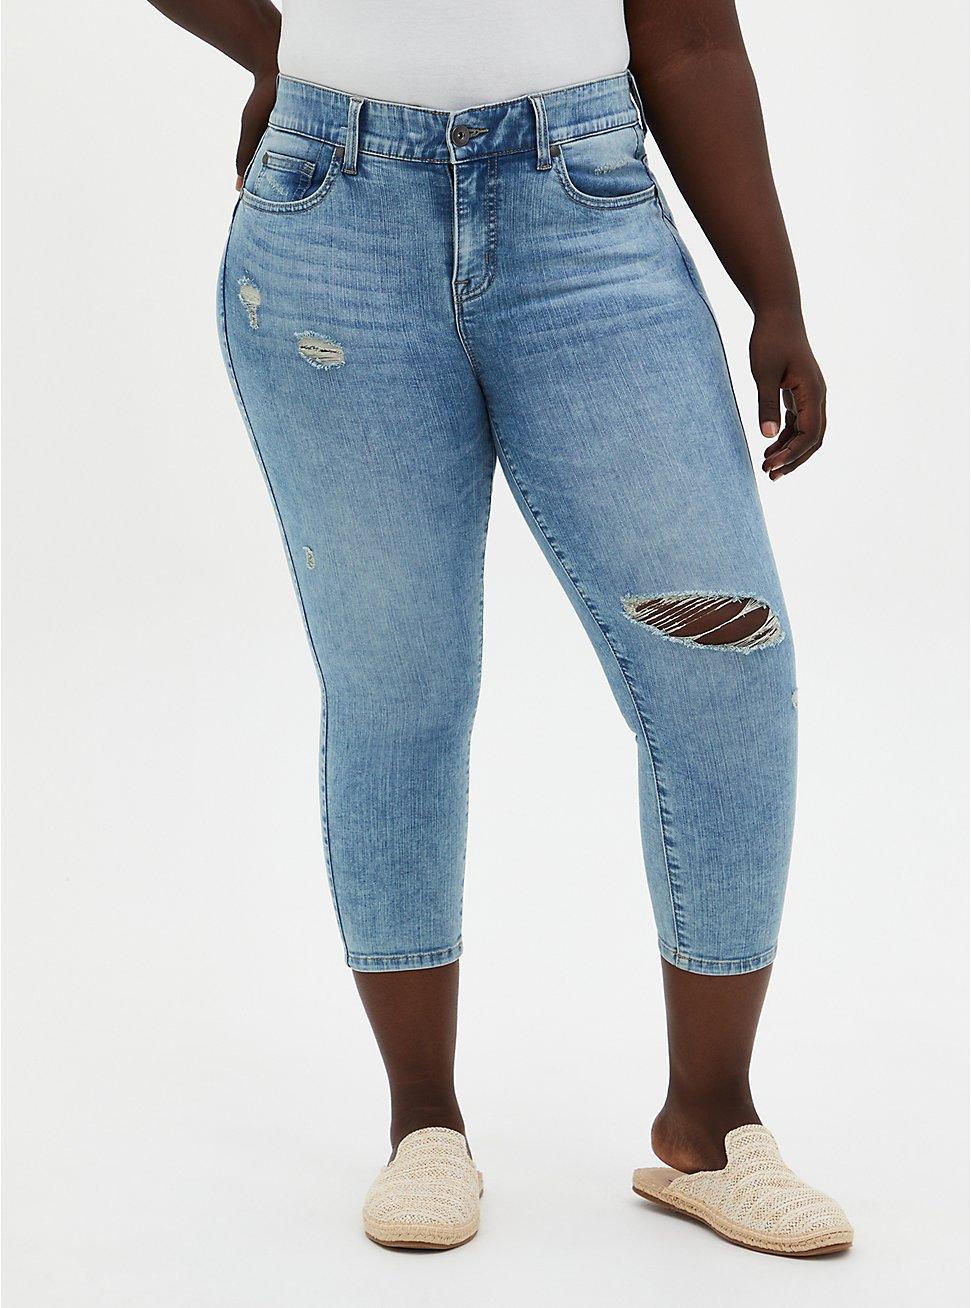 Crop Bombshell Skinny Jean - Premium Stretch Eco Light Wash, , fitModel1-hires